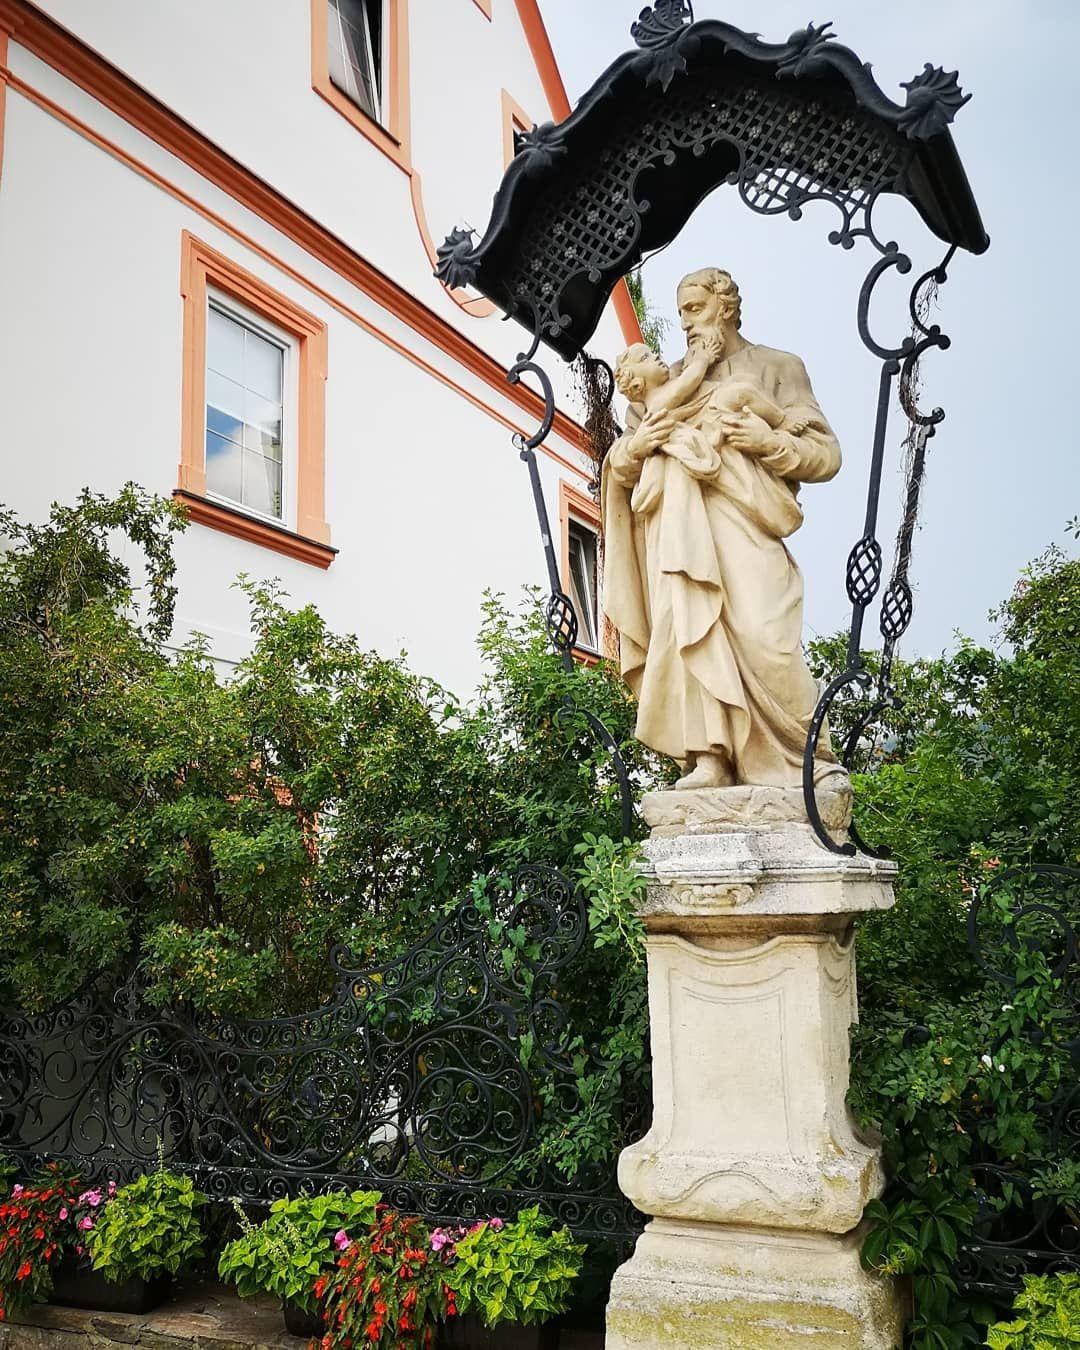 Insekten Garten Foto Fotografie Stadt Kultur Happyday Kunst Blumen Rosen Landschaft Natur Rosen Global Flowers Kindb Greek Statue Statue Garten